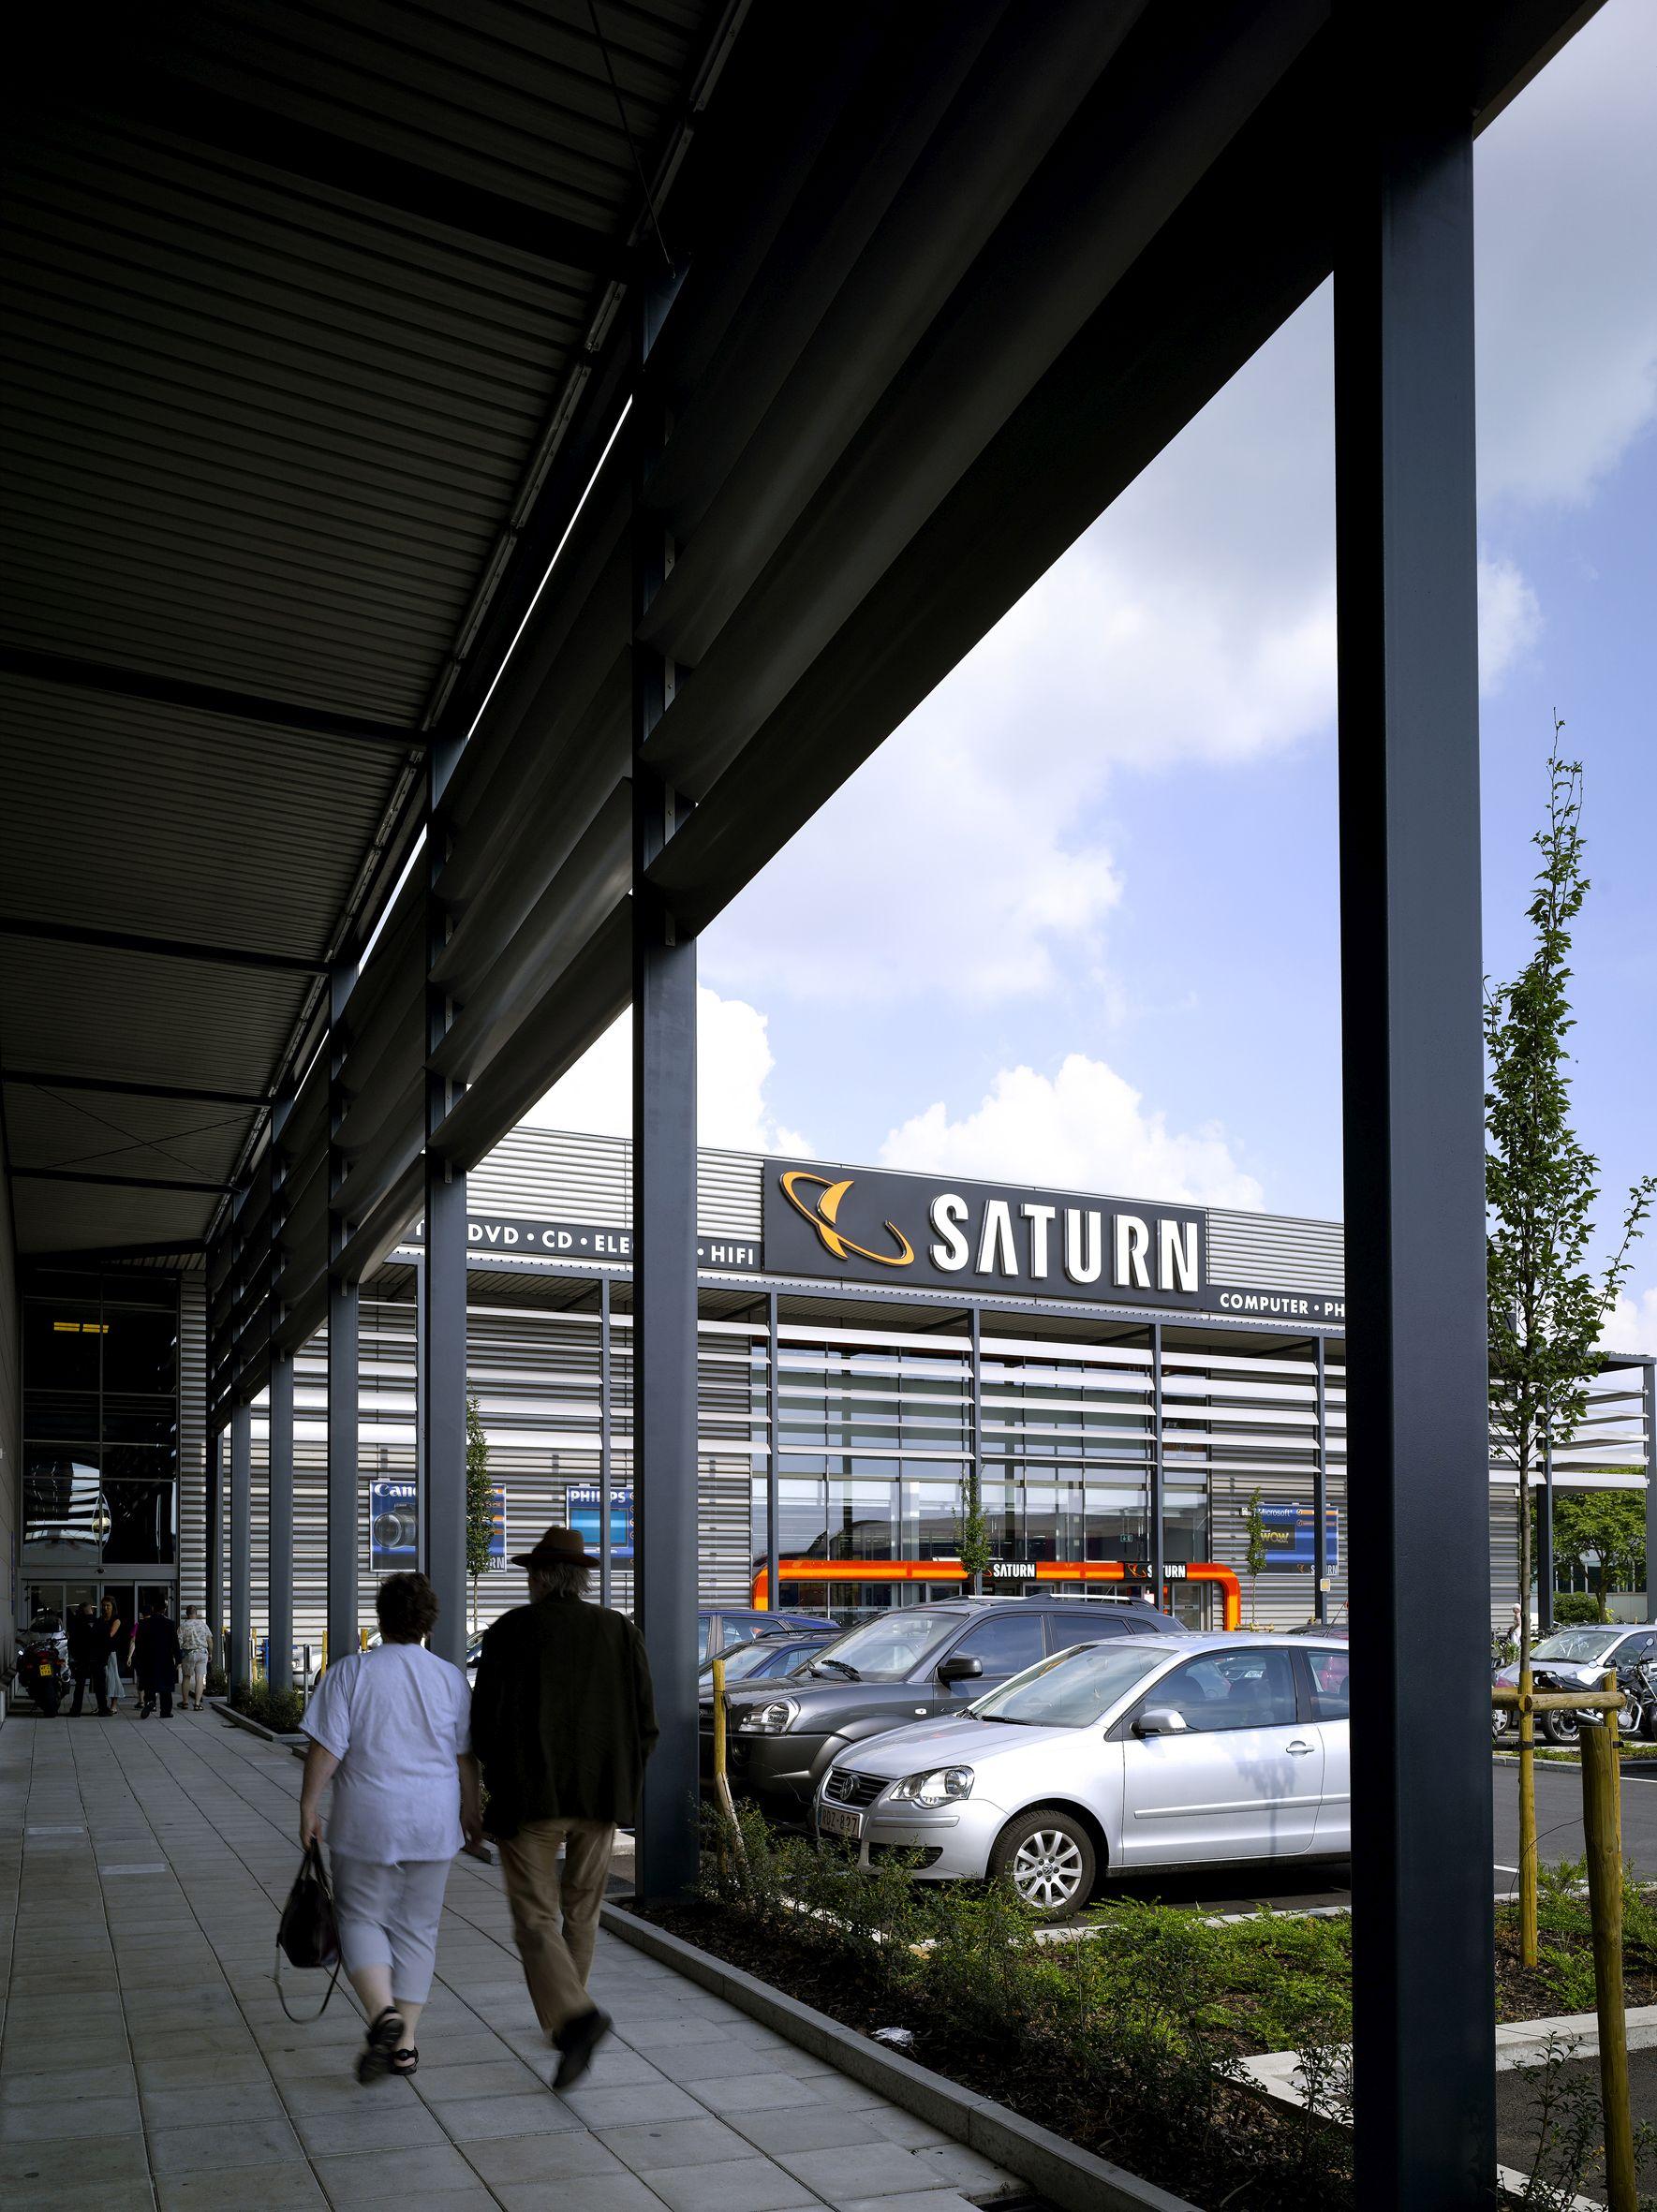 Retail Brico/Mediamarkt Wilrijk, parking. Project i.s.m. Michel Pauwels